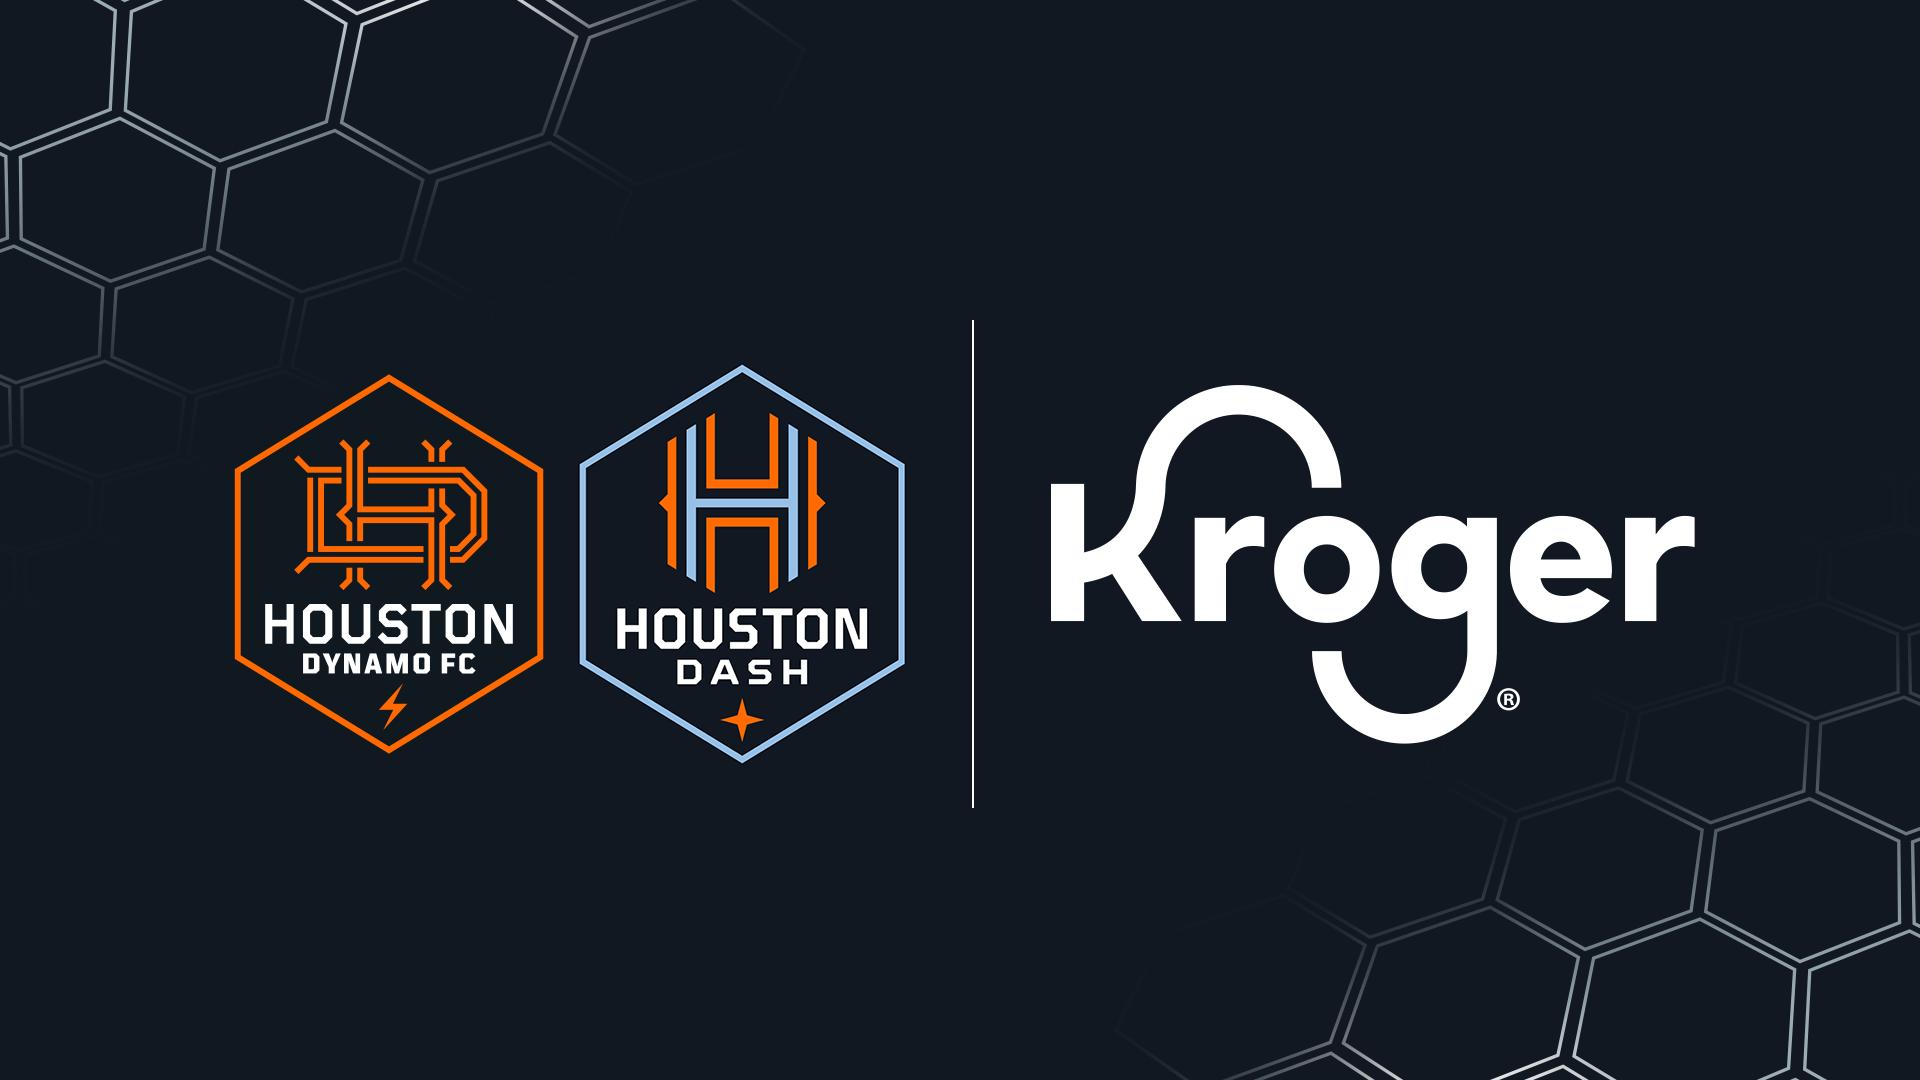 Houston Dynamo FC, Kroger extend & expand partnership  | Houston Dynamo